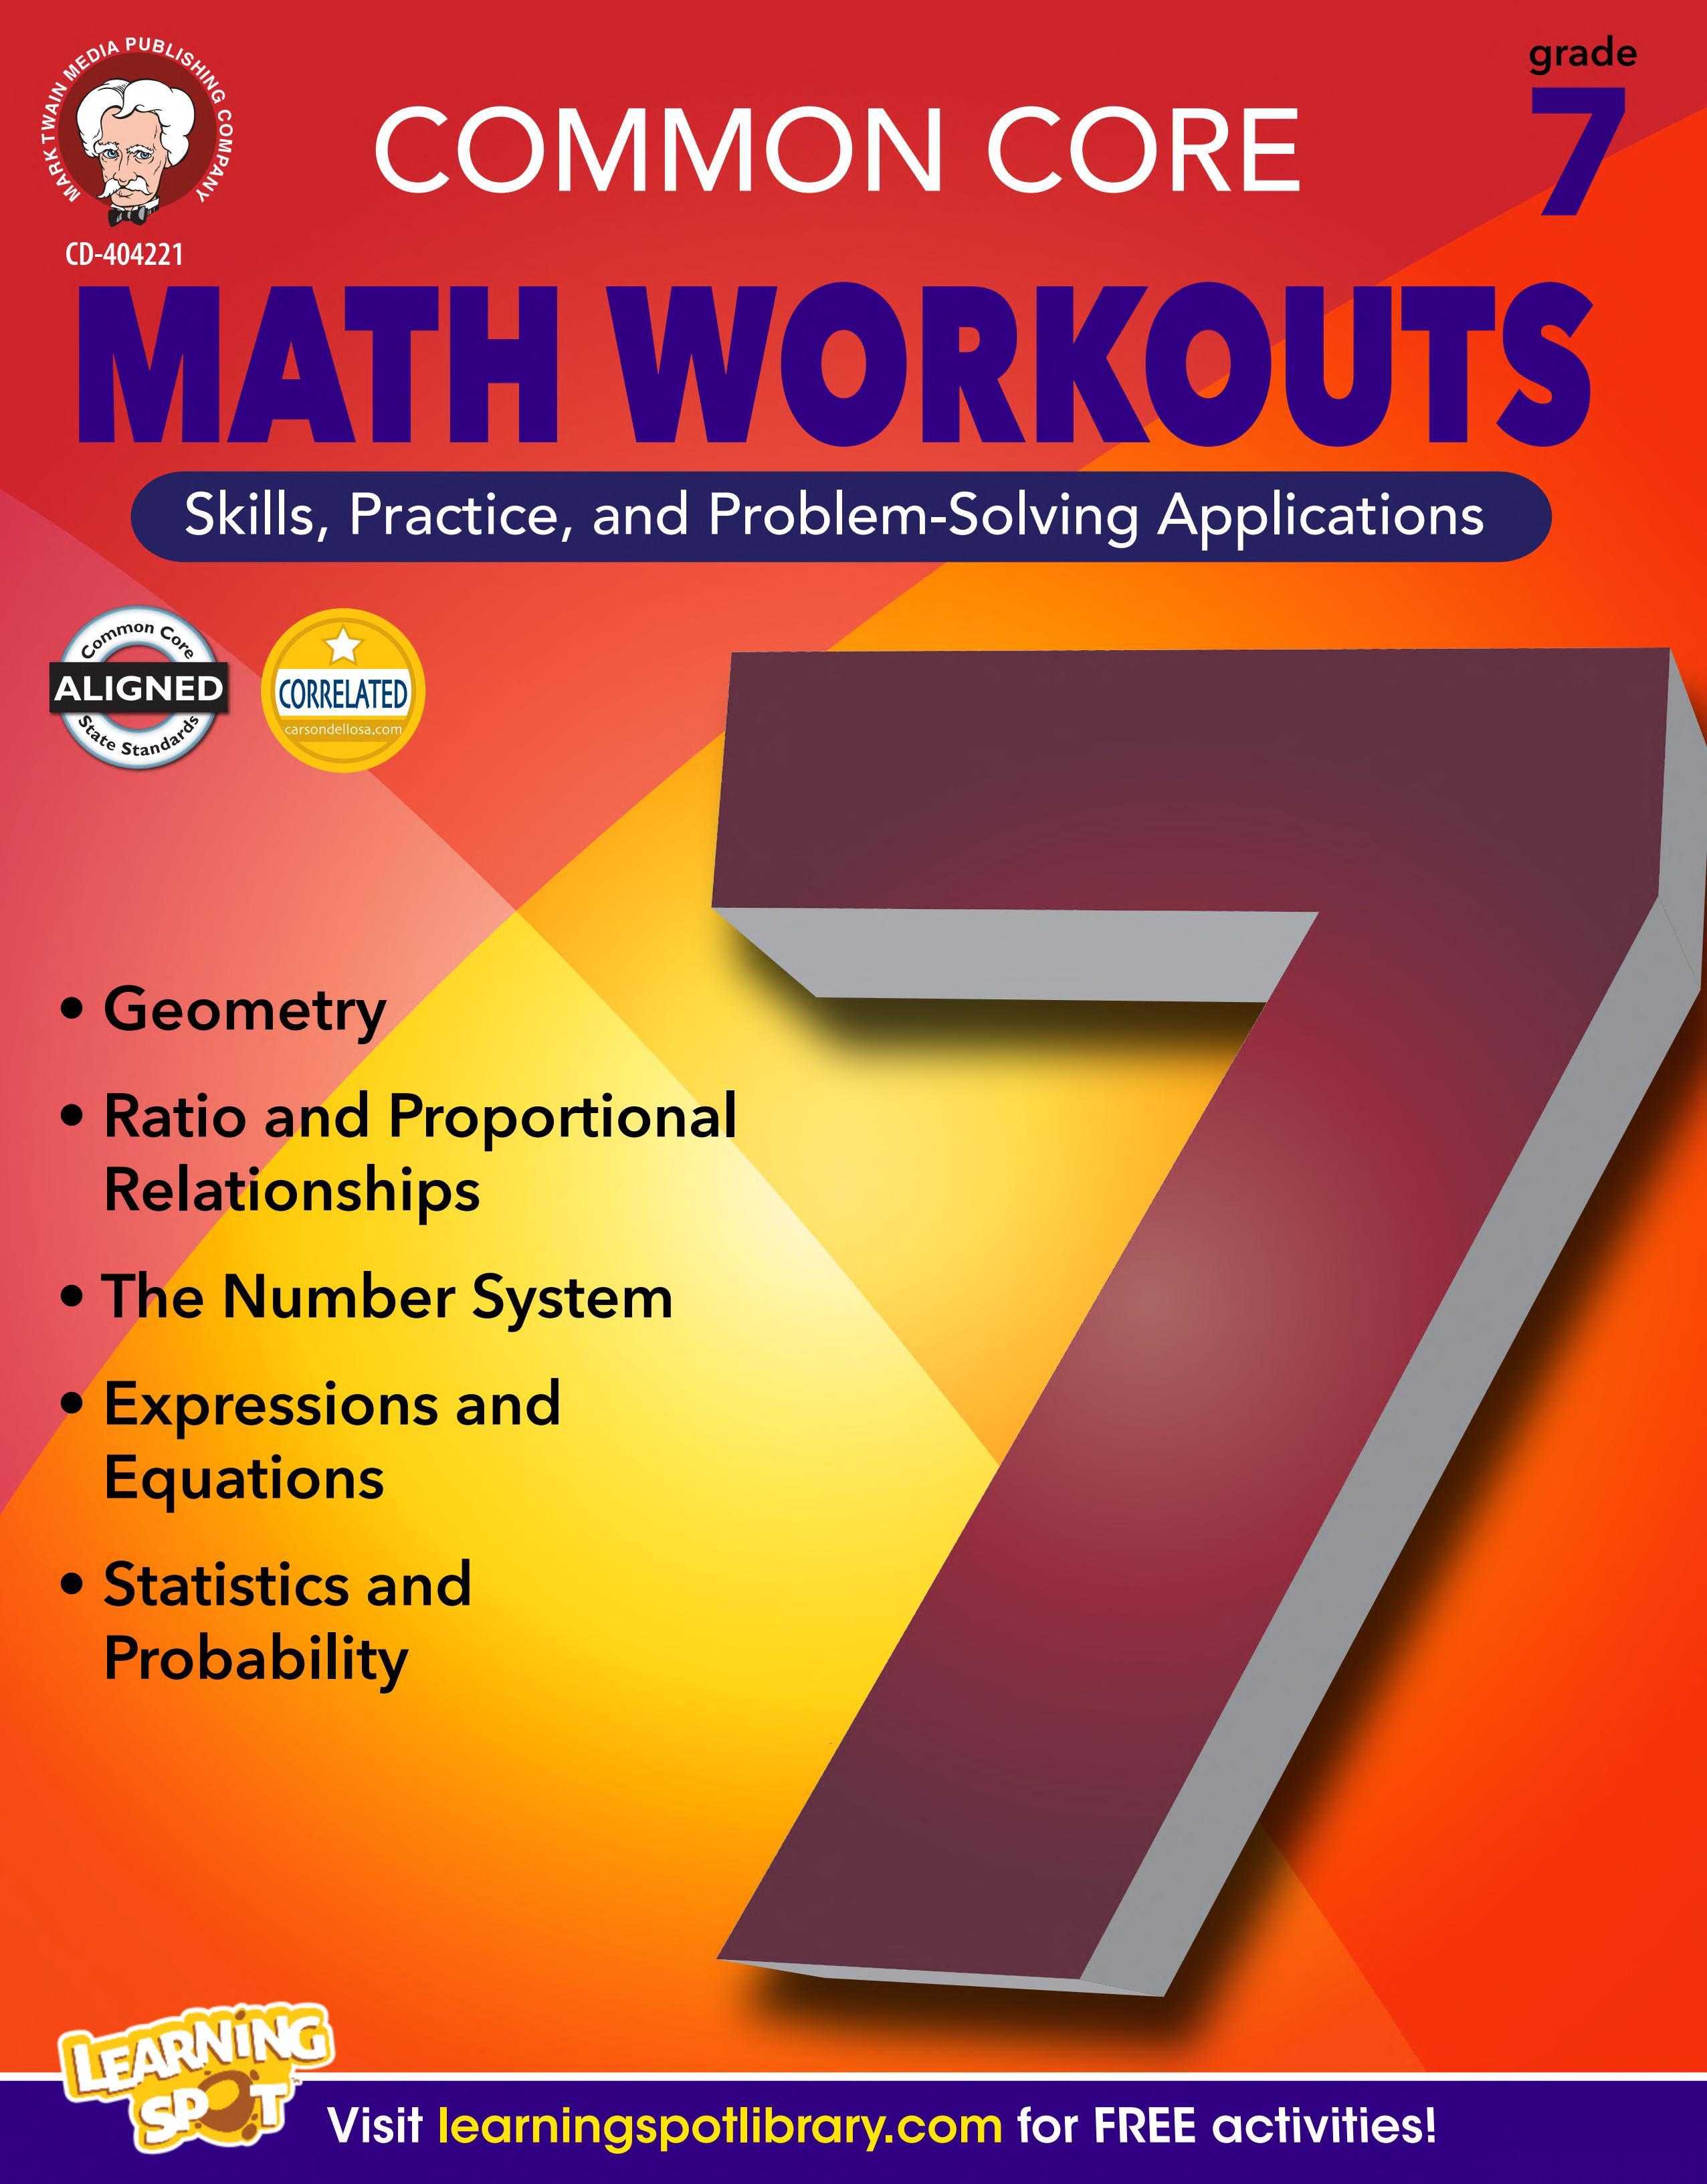 Common Core Math Workouts  Grade 7